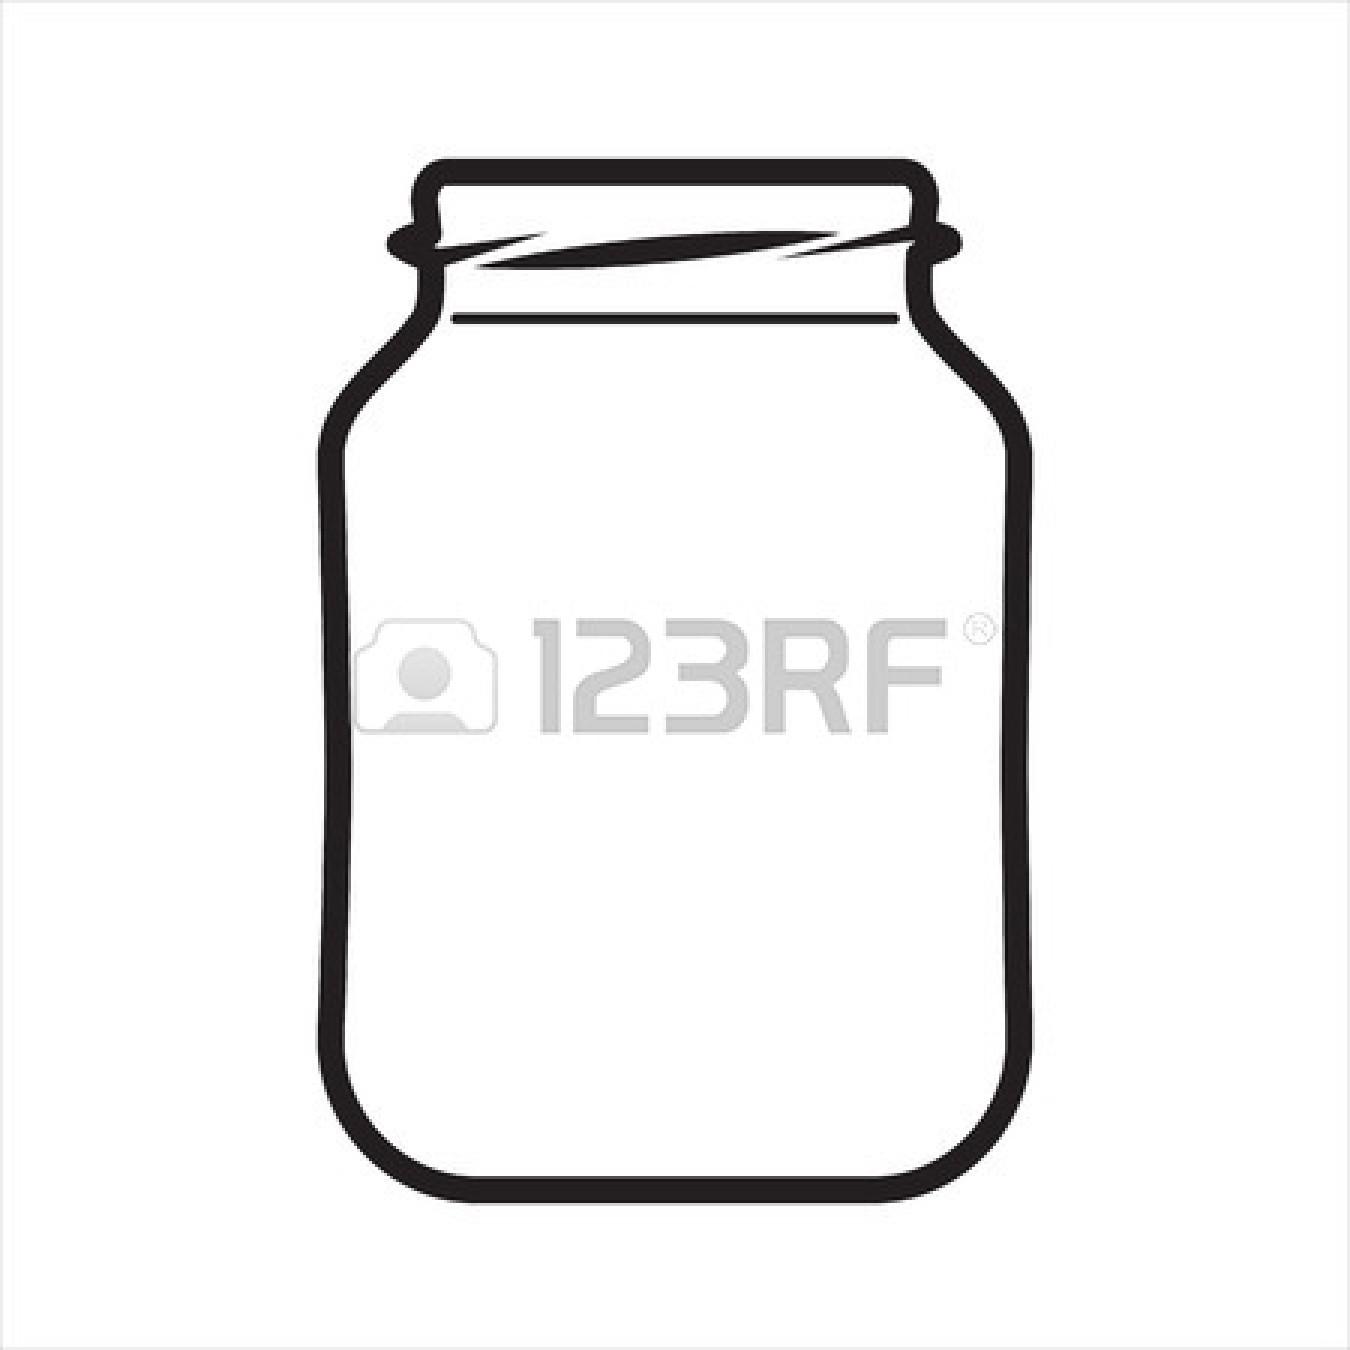 open jar clipart clipart suggest